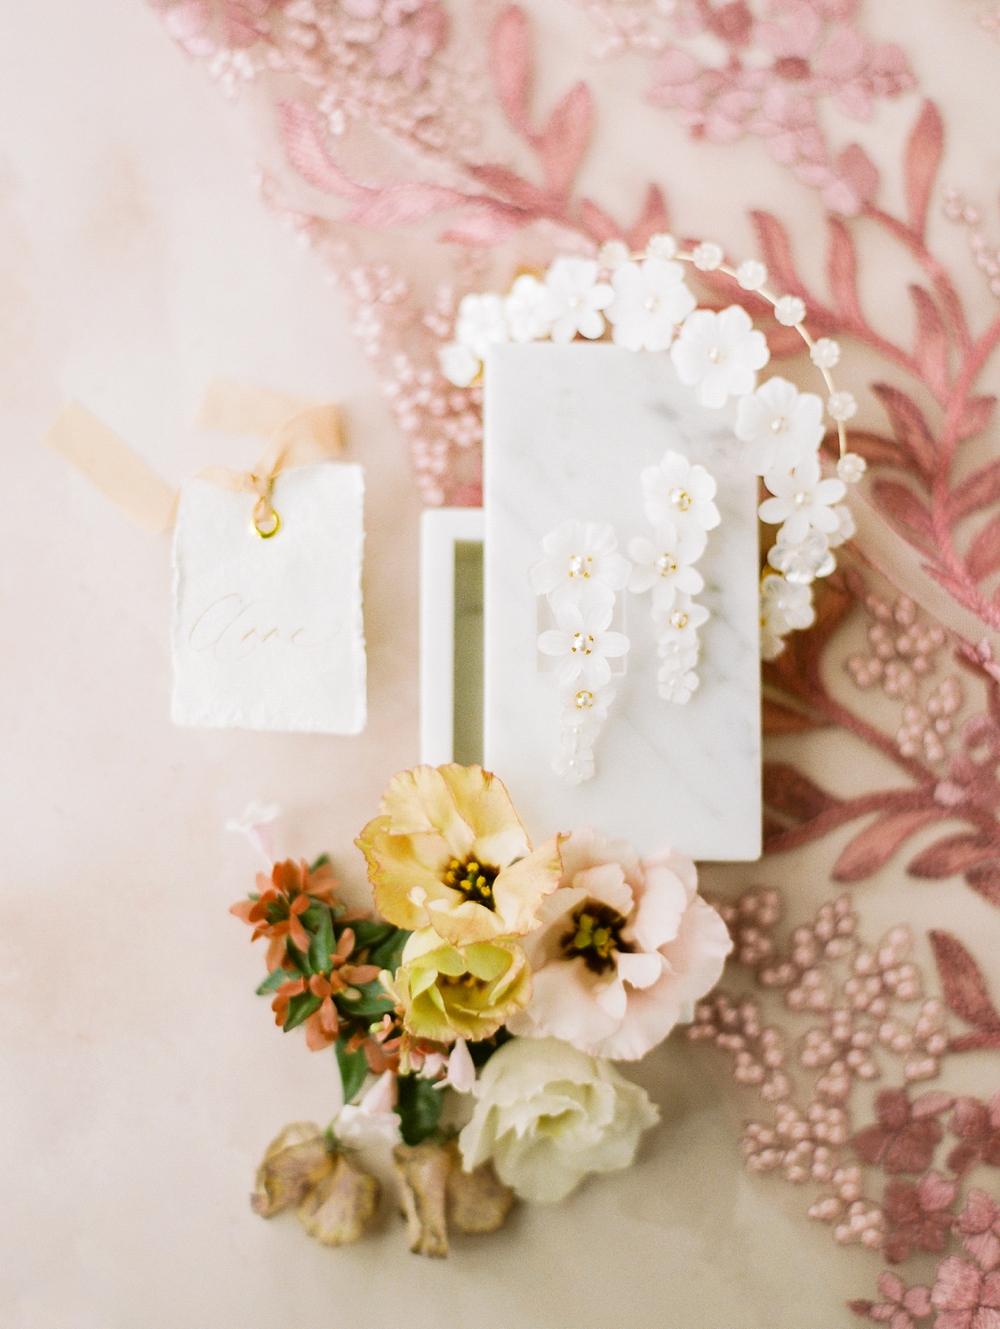 kristin-la-voie-photography-TEXAS-Wedding-Photographer-THE-OLANA-DALLAS-FINE-ART-15